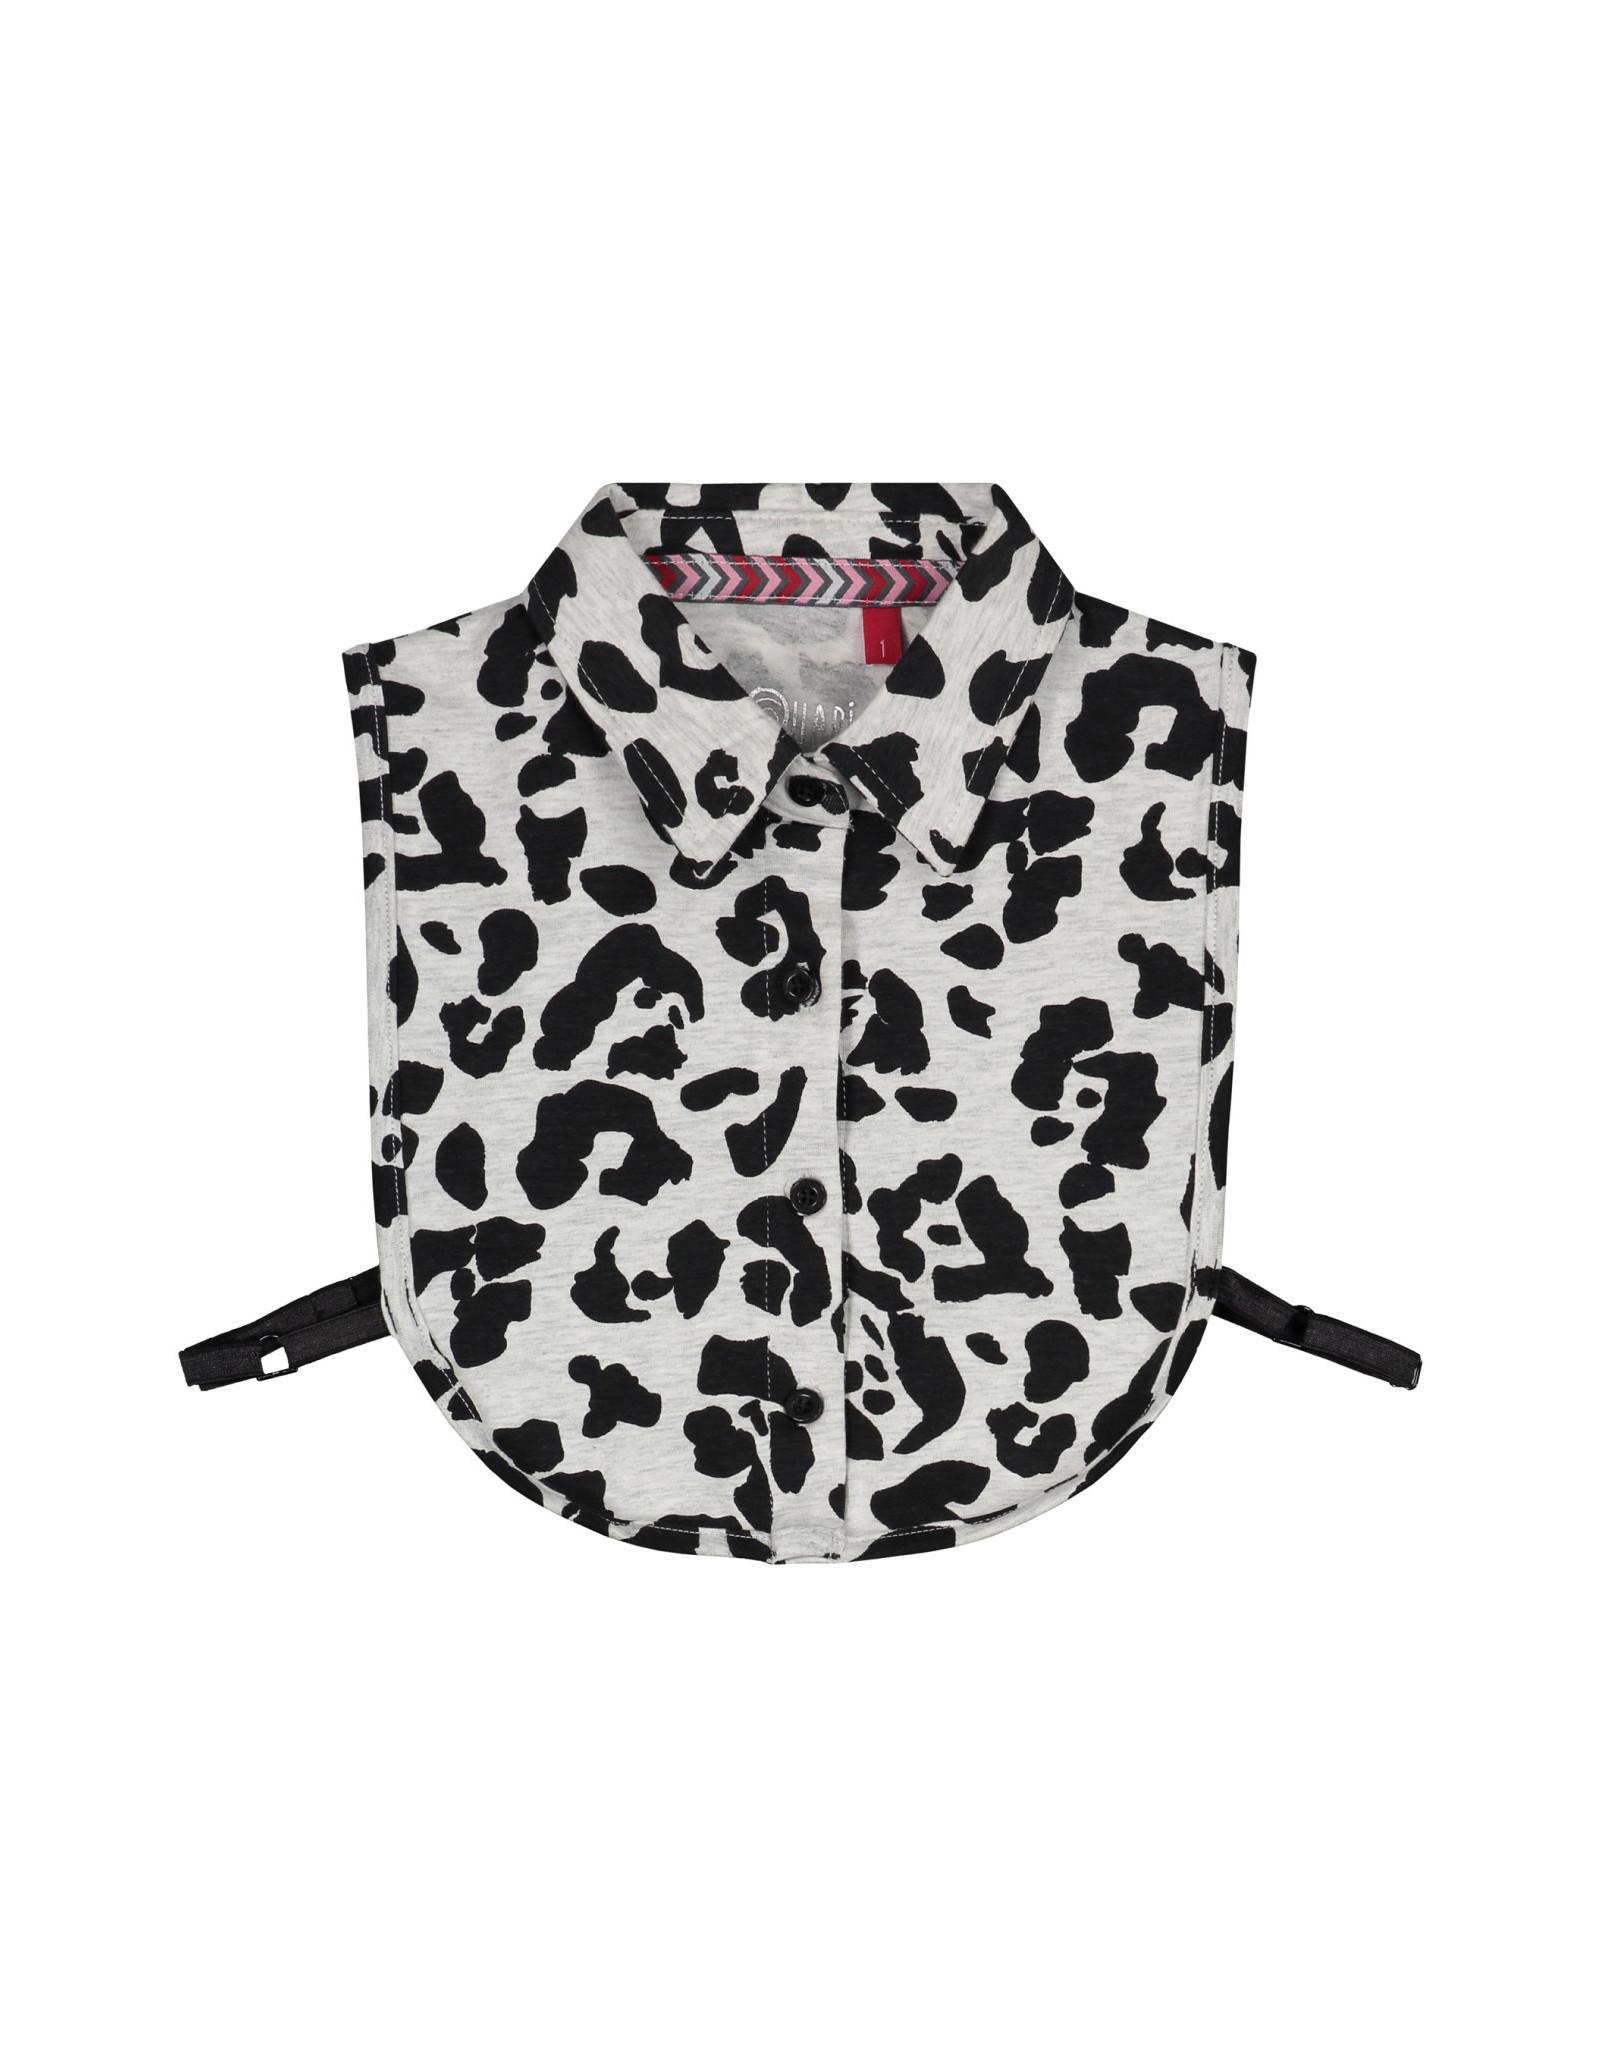 Quapi Anoah S201 Collar Dark grey leopard